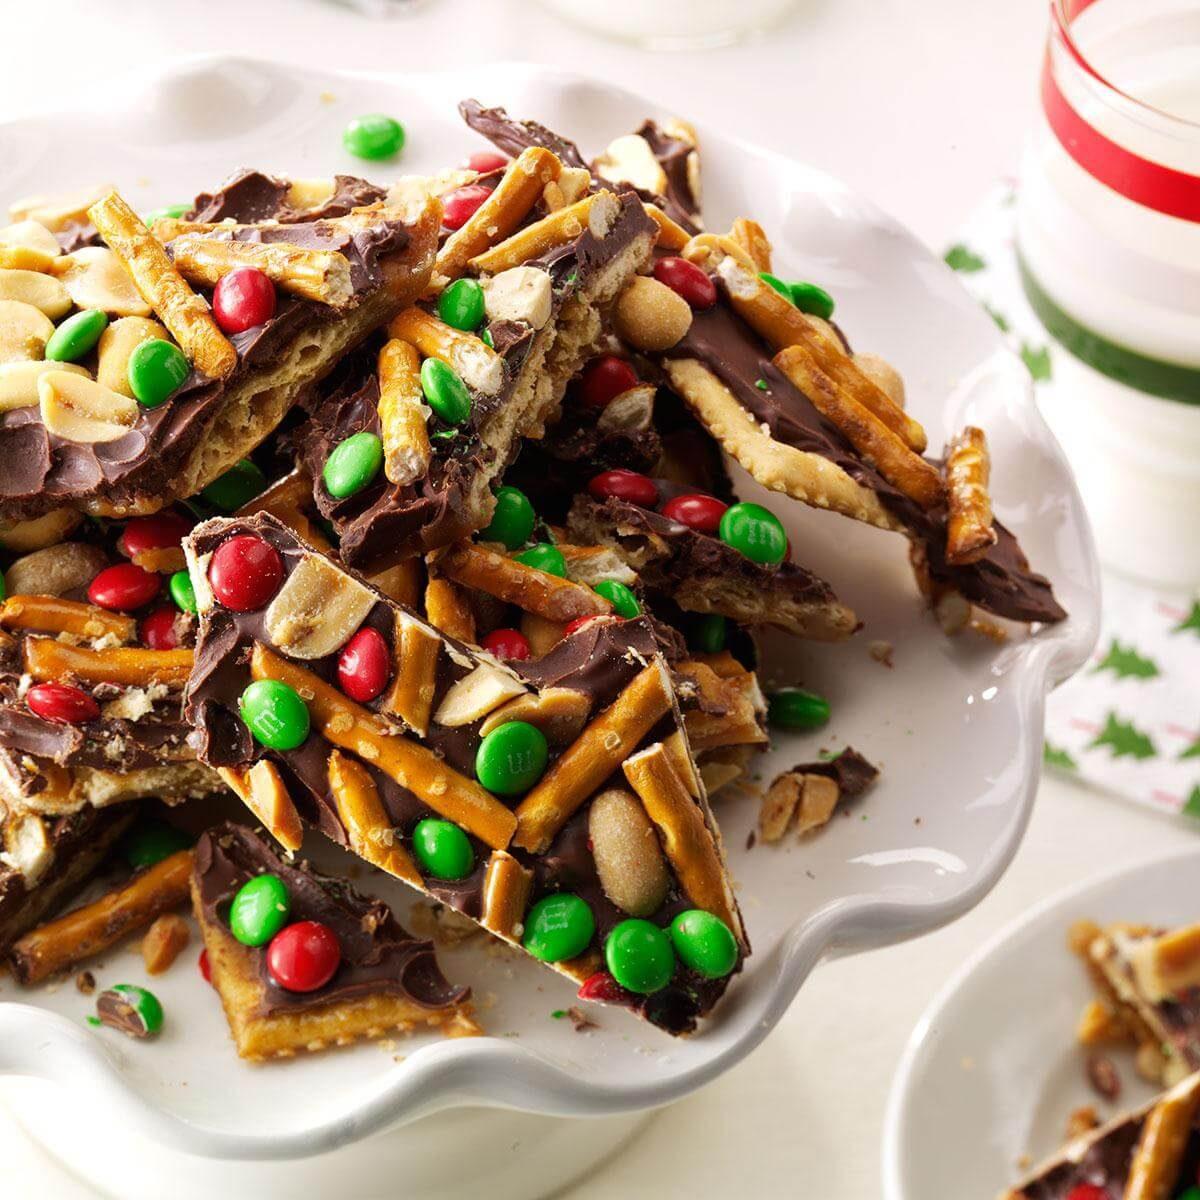 Chocolate Pretzel Logs Dunmore Candy Kitchen: Chocolate, Peanut & Pretzel Toffee Crisps Recipe